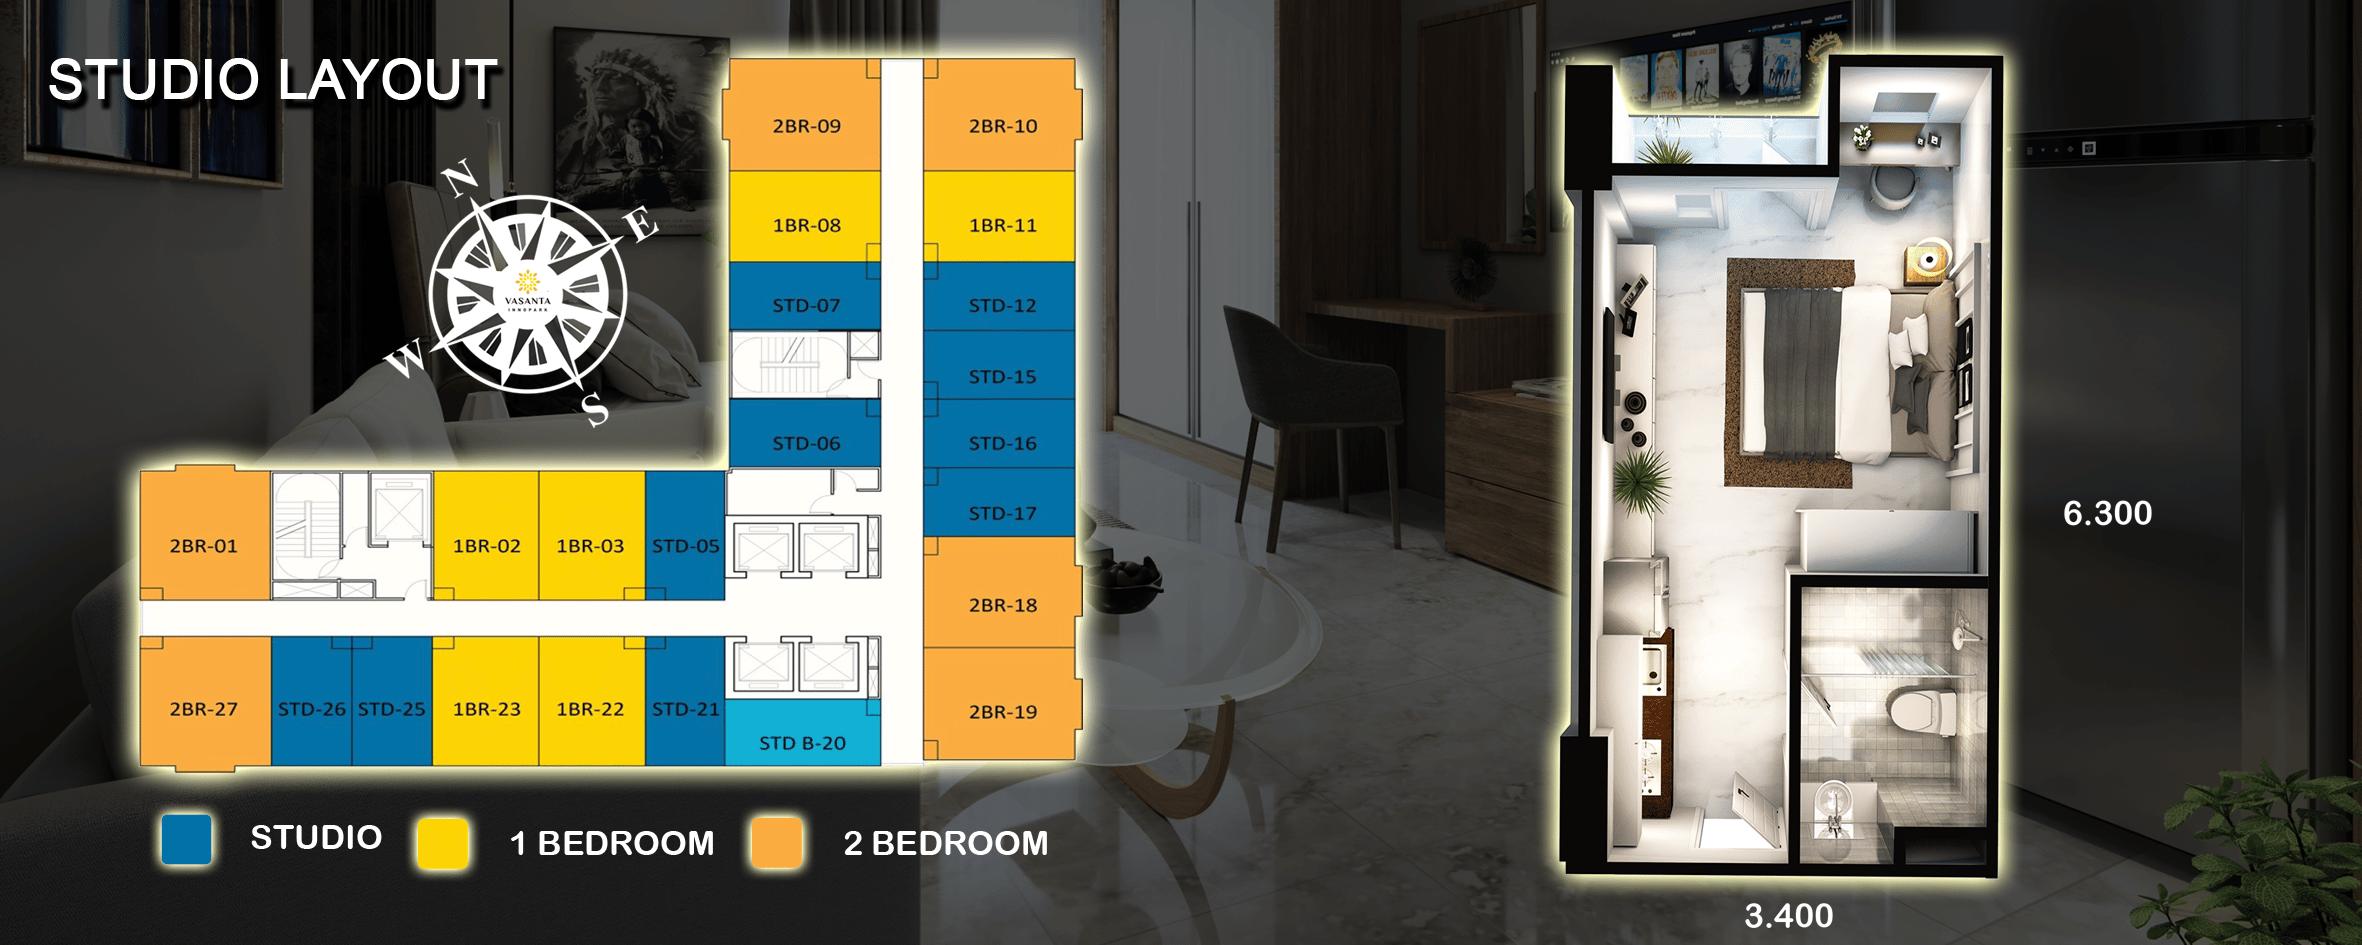 STUDIO LAYOUT, Type Dan Harga Apartemen Vasanta Innopark MM2100 Cibitung